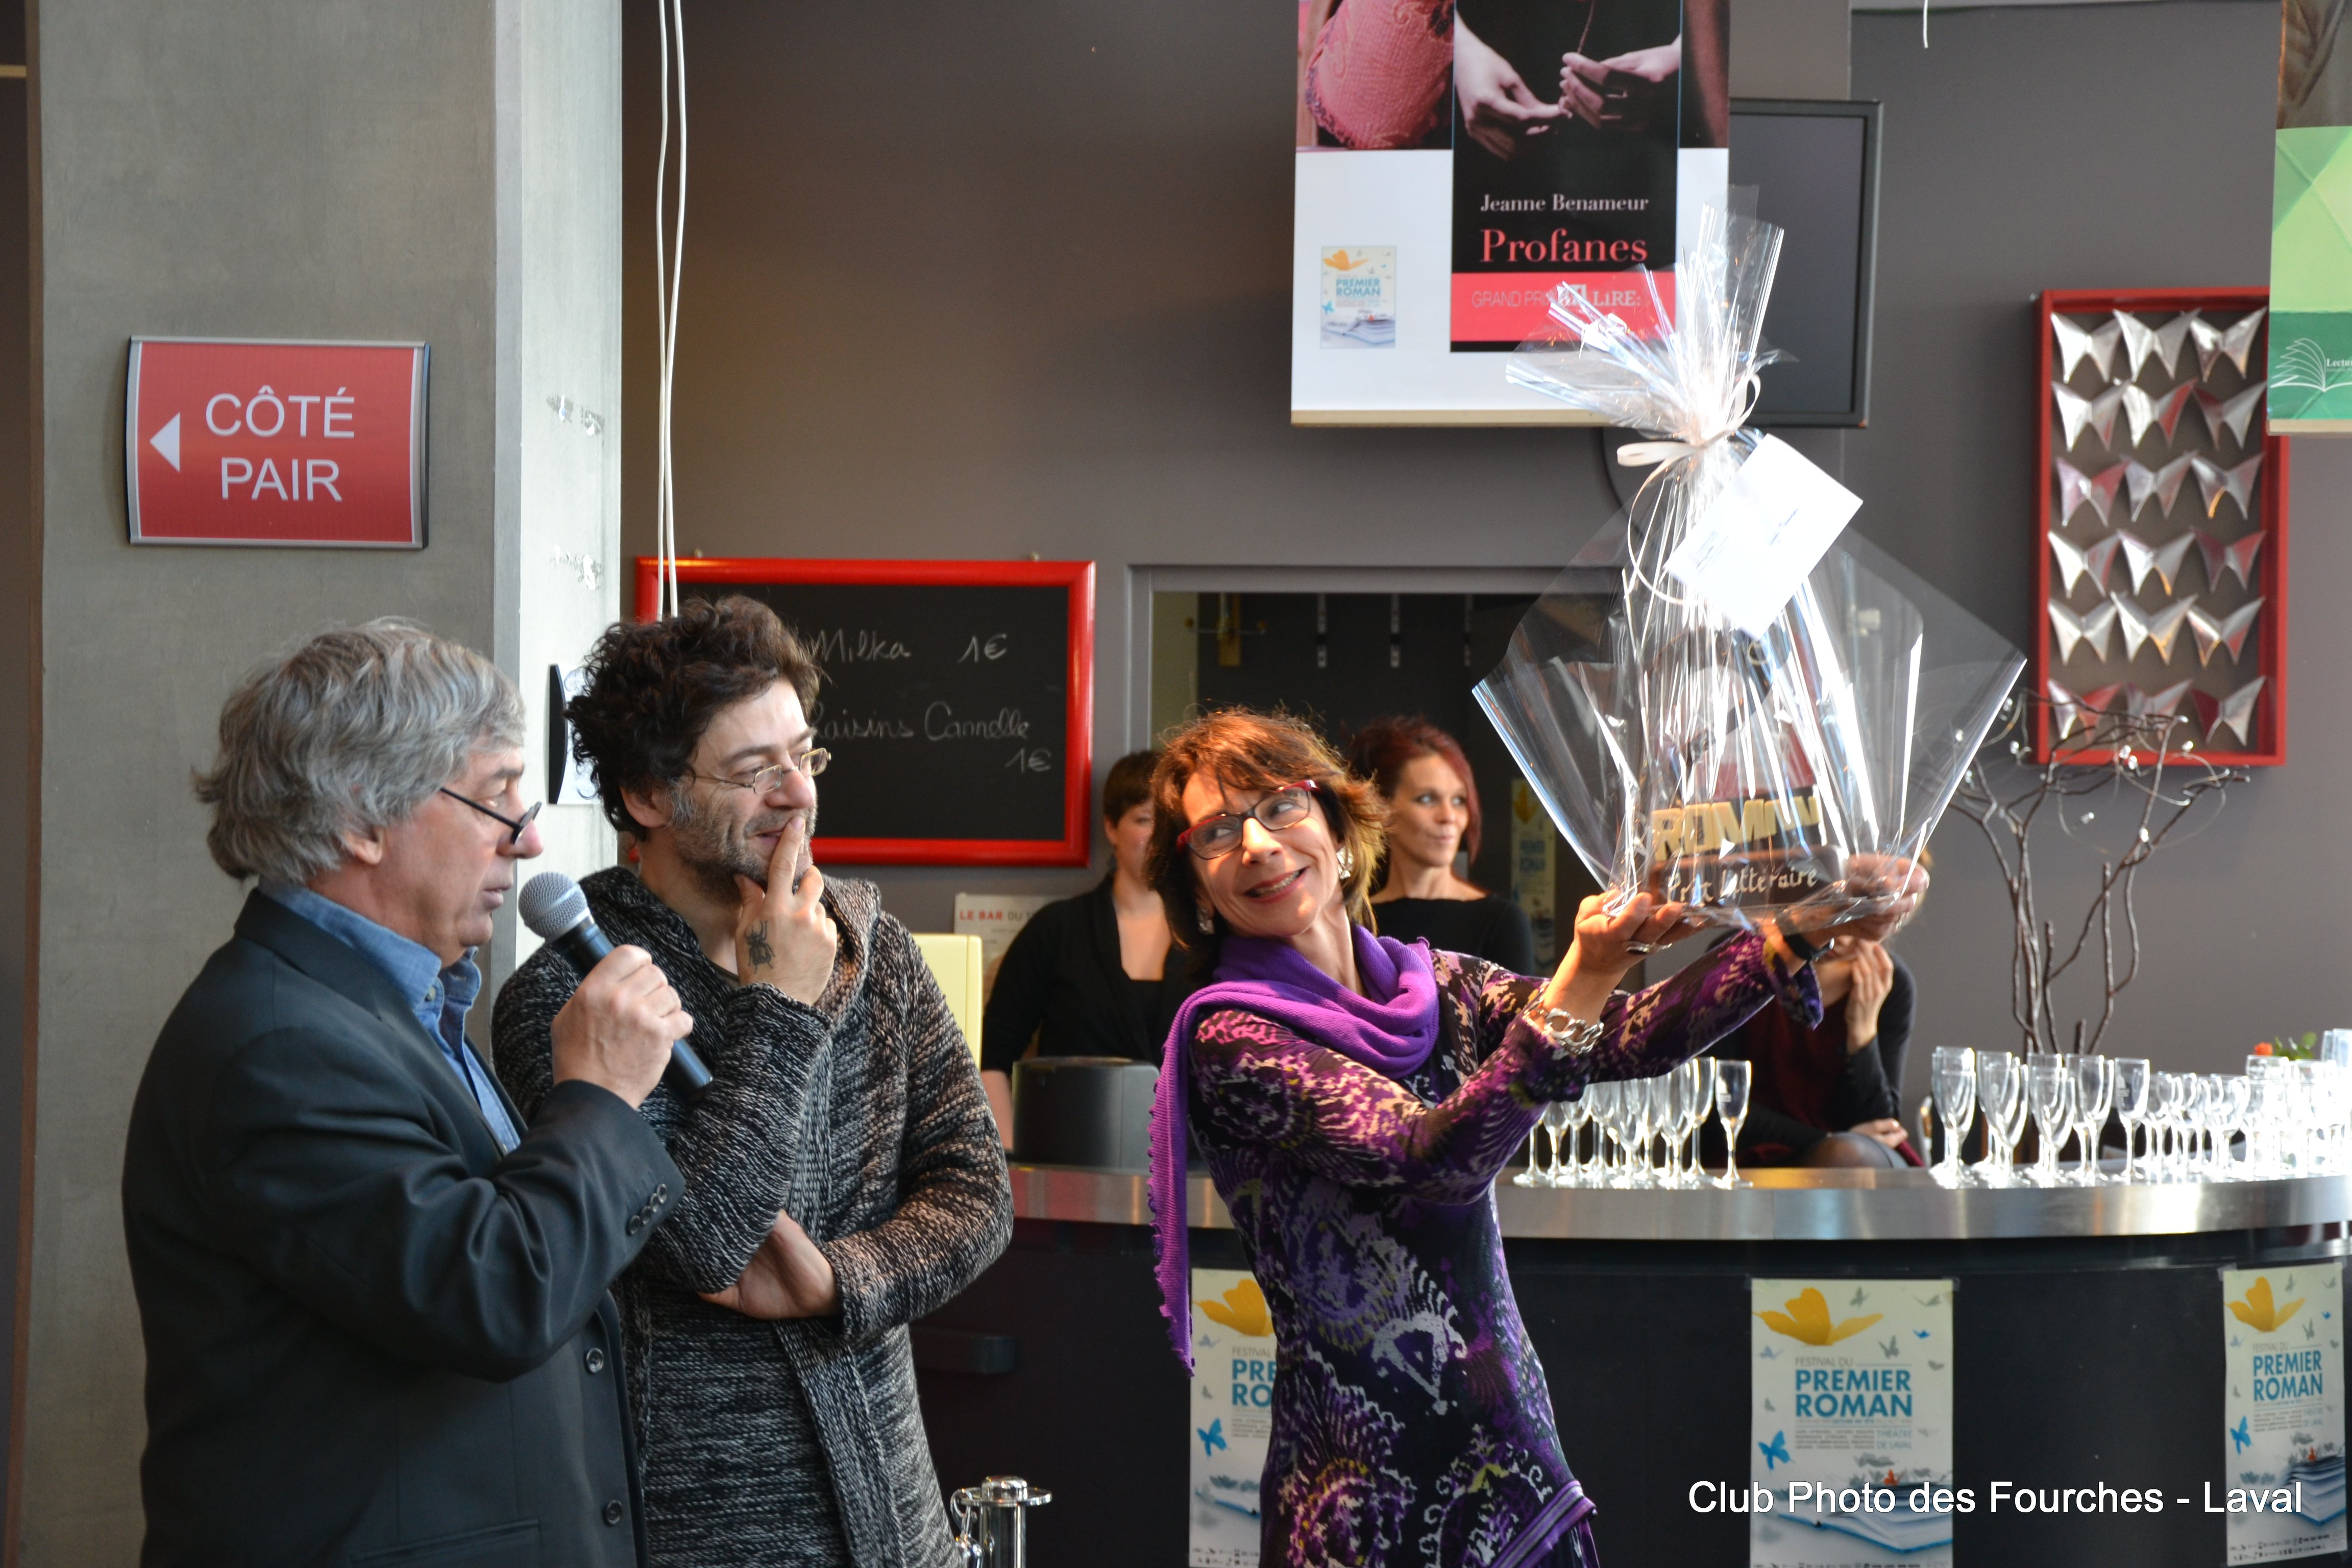 prix rencontre 2012